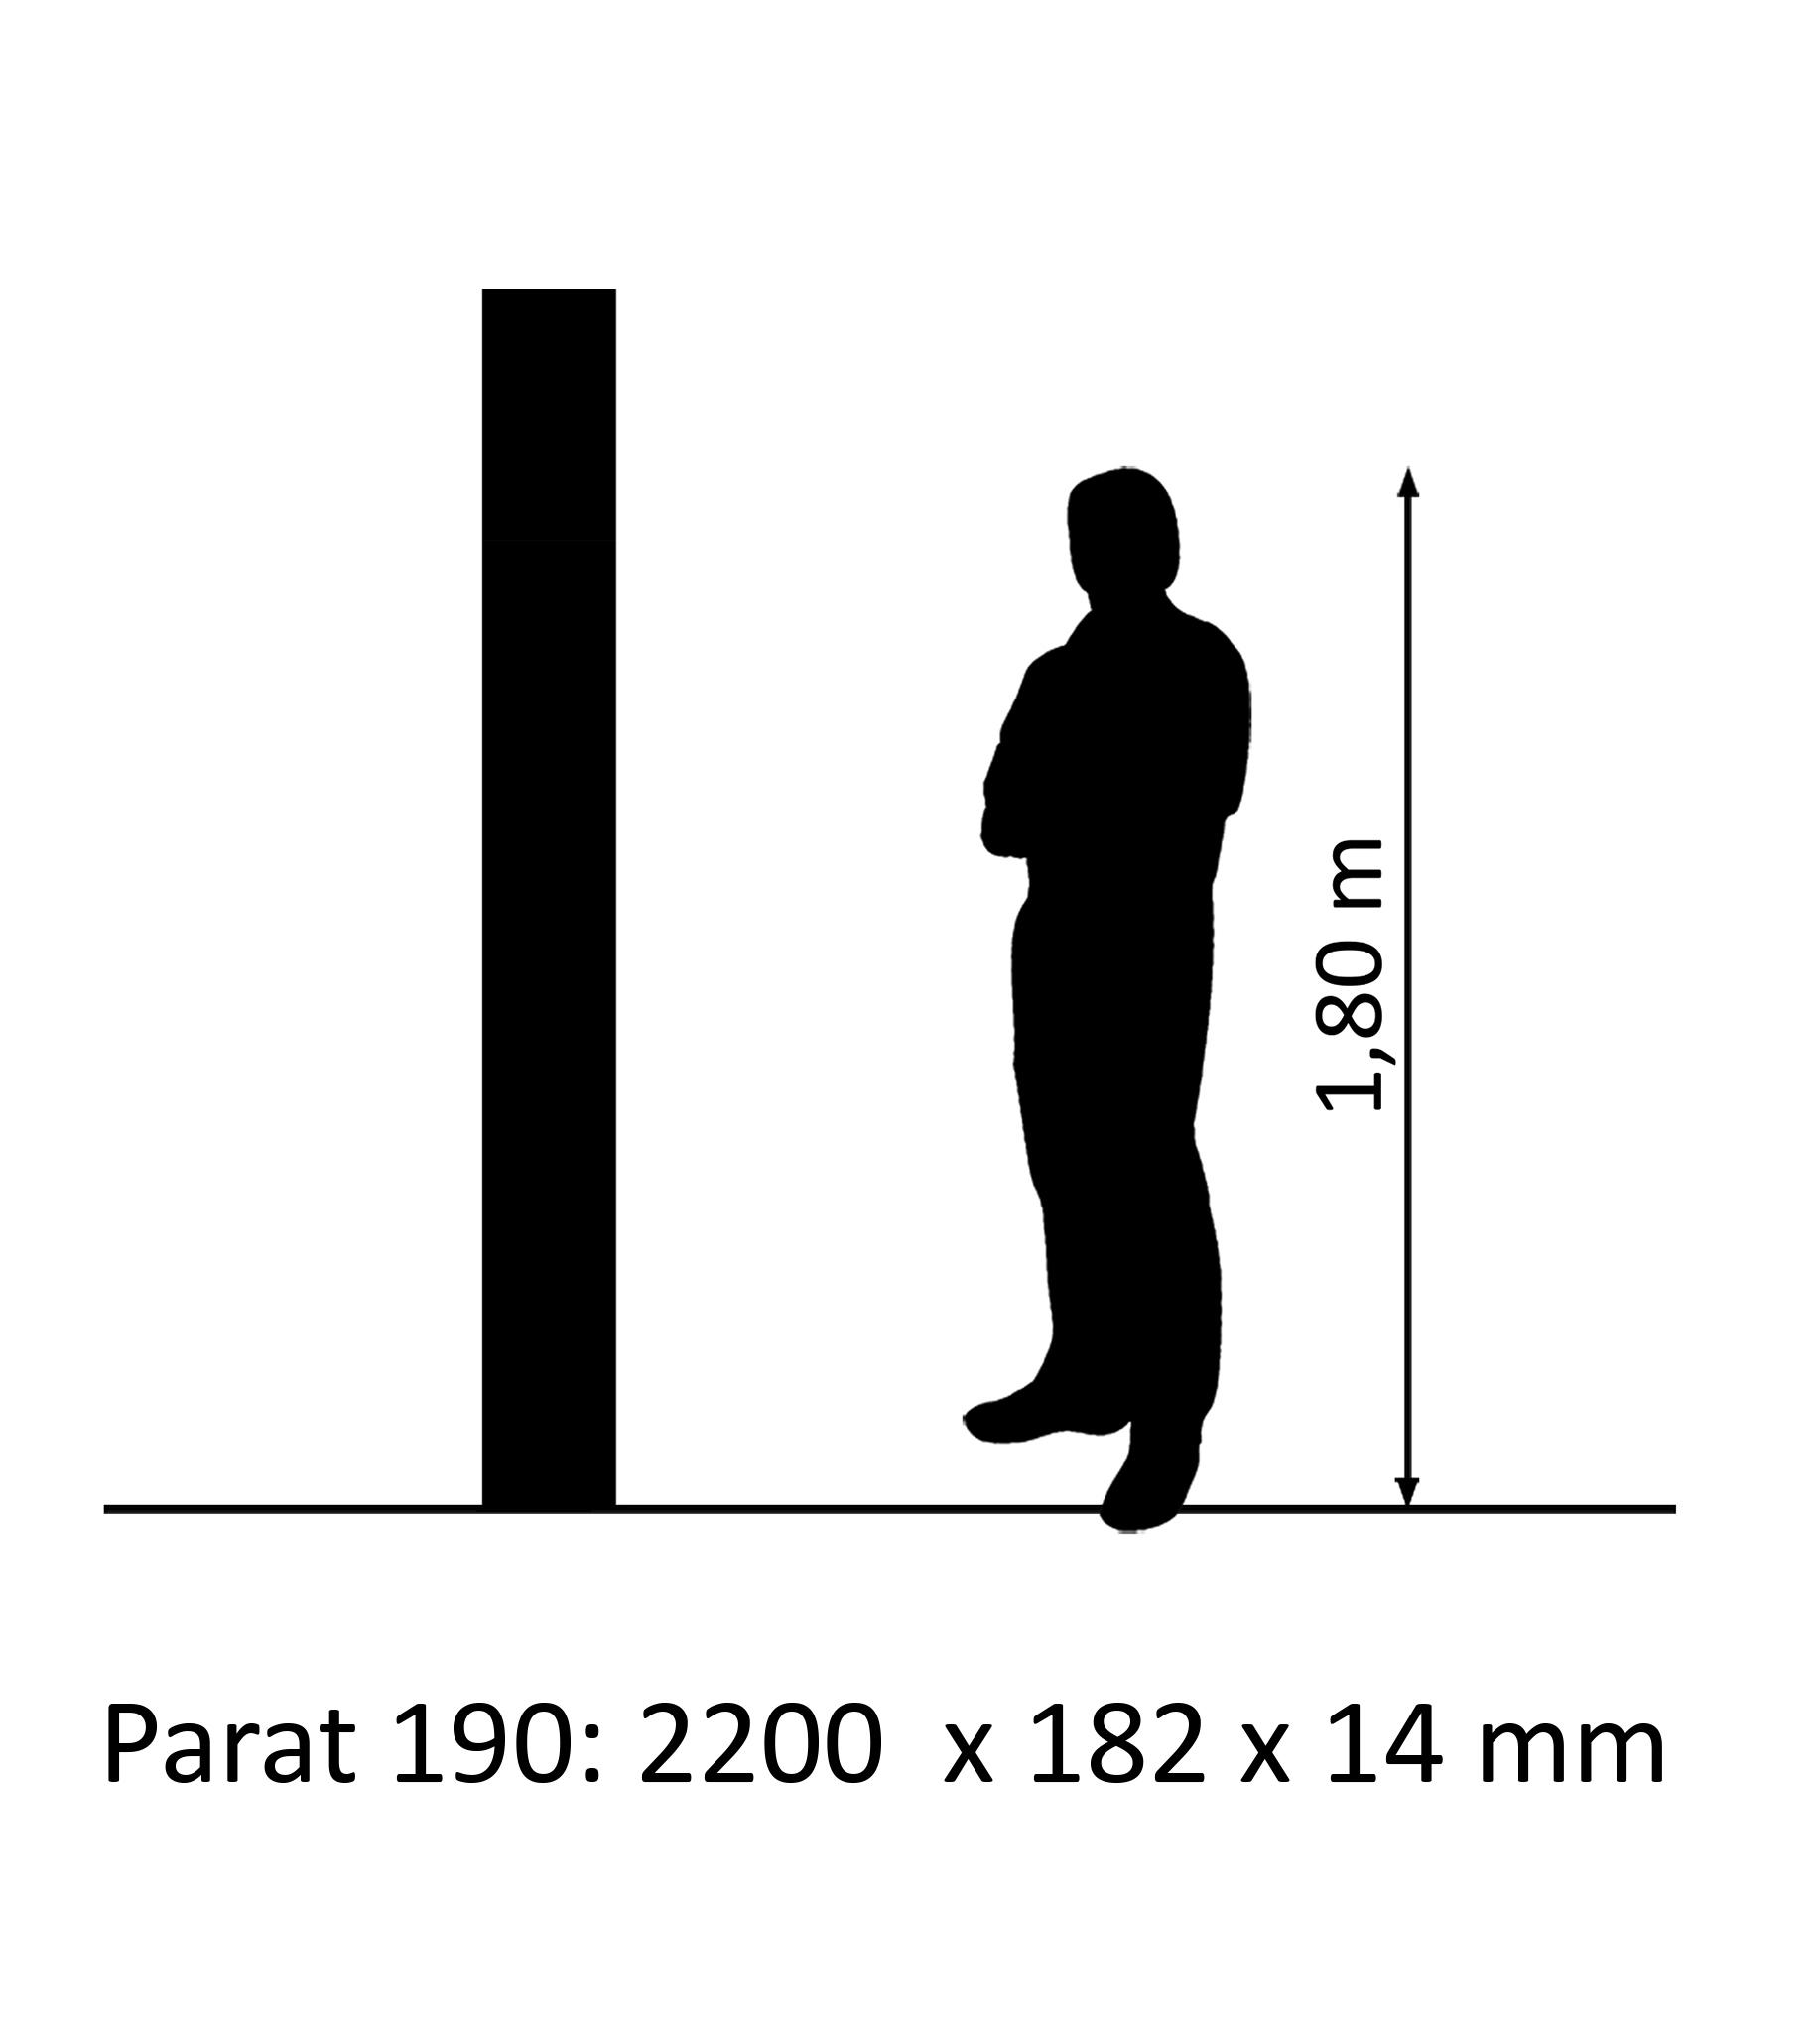 PARAT 190 can. Maple avantgarde 3-Strip